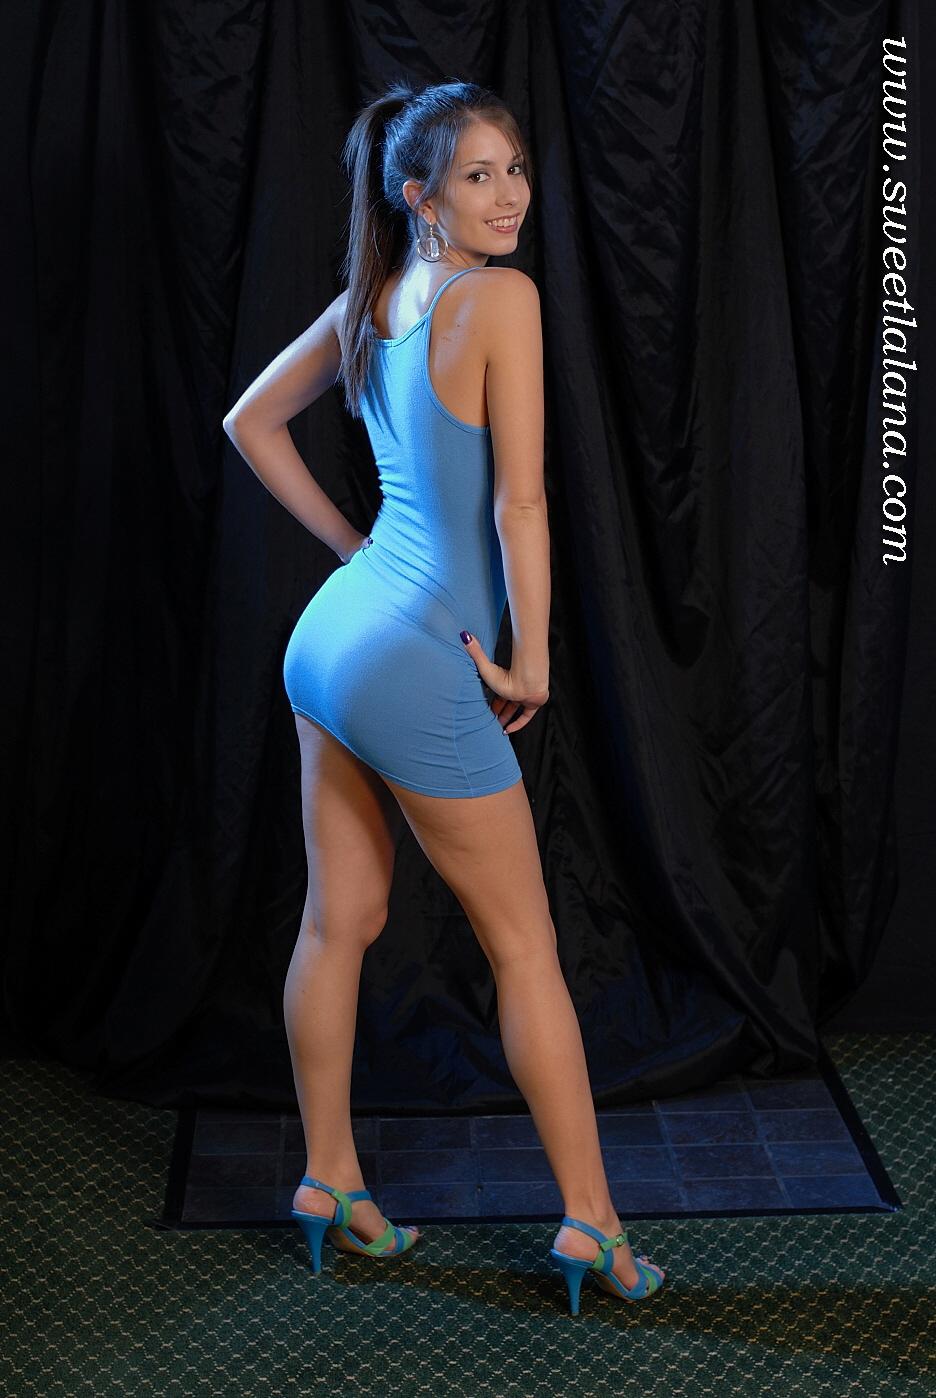 Bridget midget nude Nude Photos